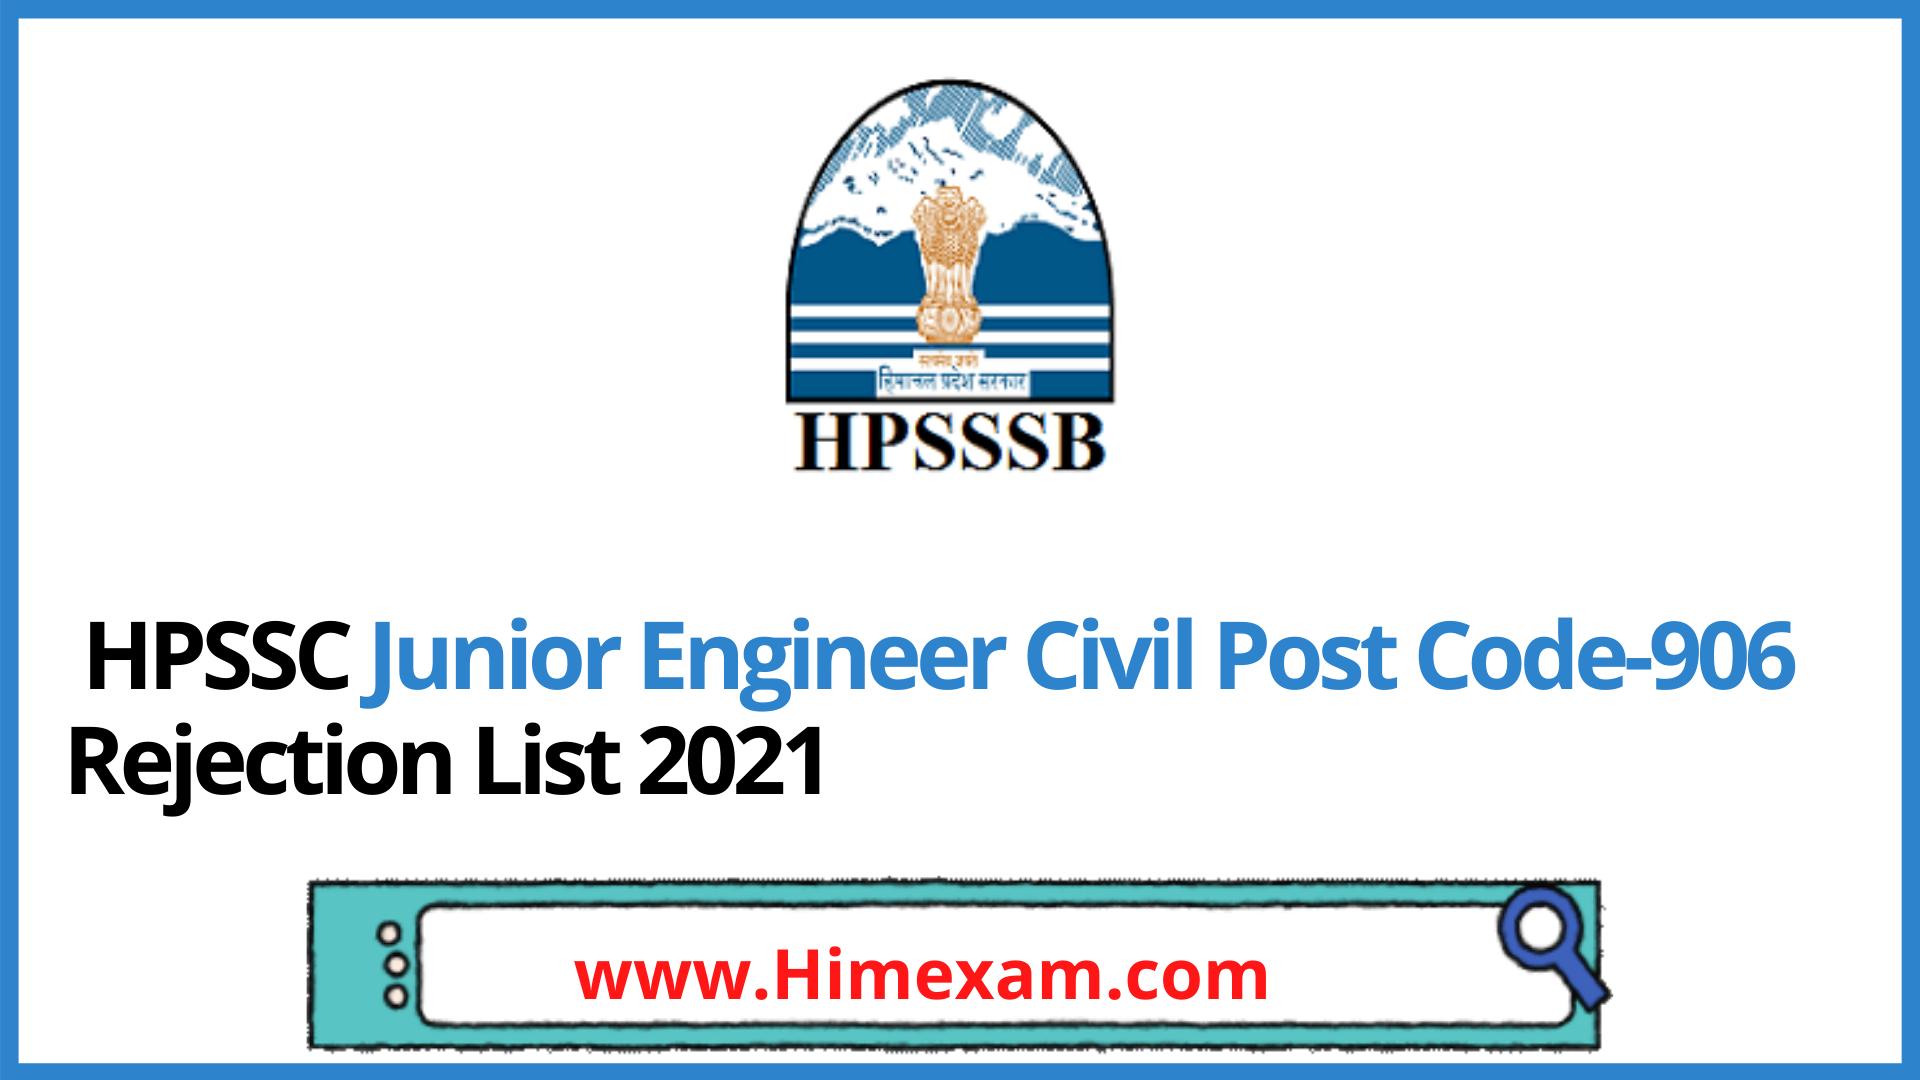 HPSSC Hamirpur JE Civil (Post Code 923) Rejection List 2021